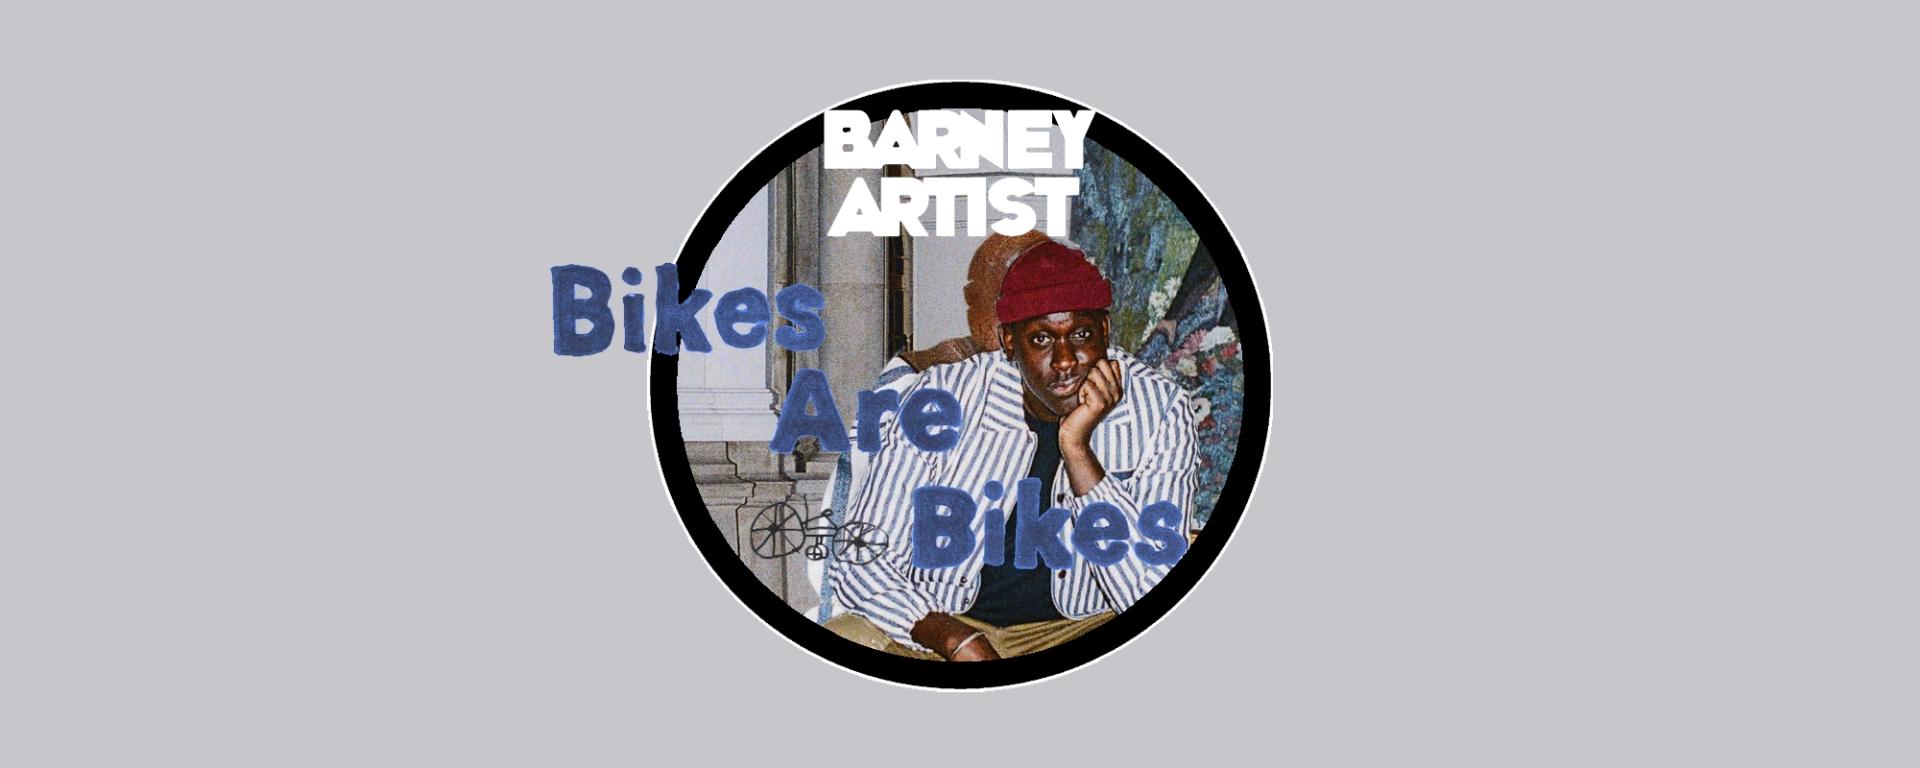 Barney Artist Bikes are Bikes EP Launch